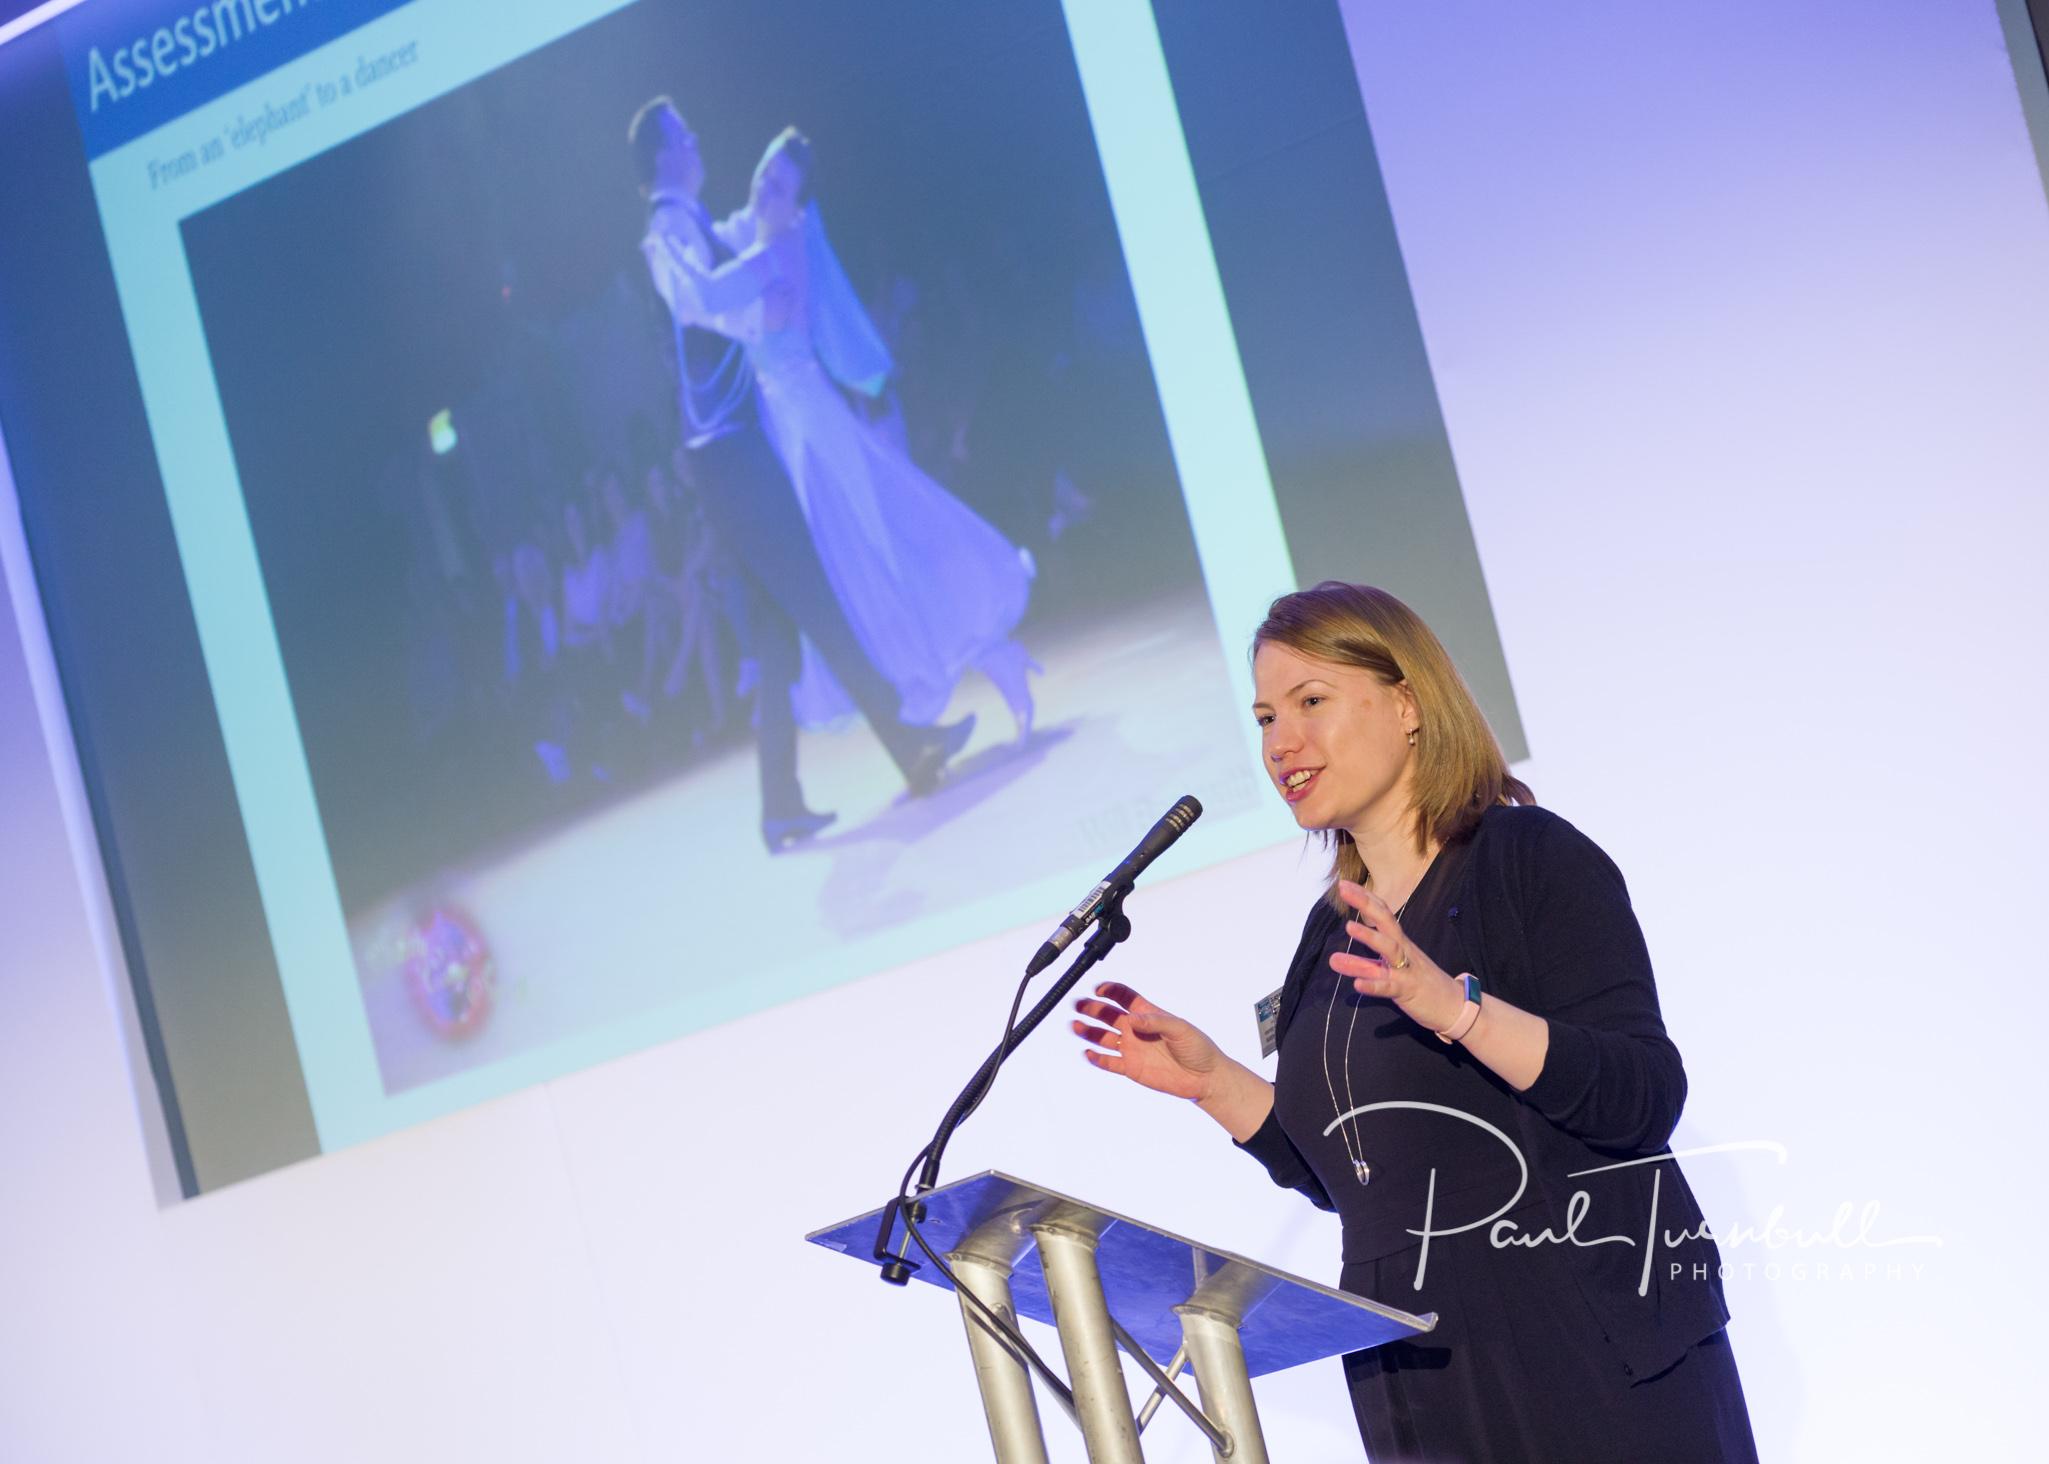 conference-event-photographer-queens-hotel-leeds-yorkshire-046.jpg